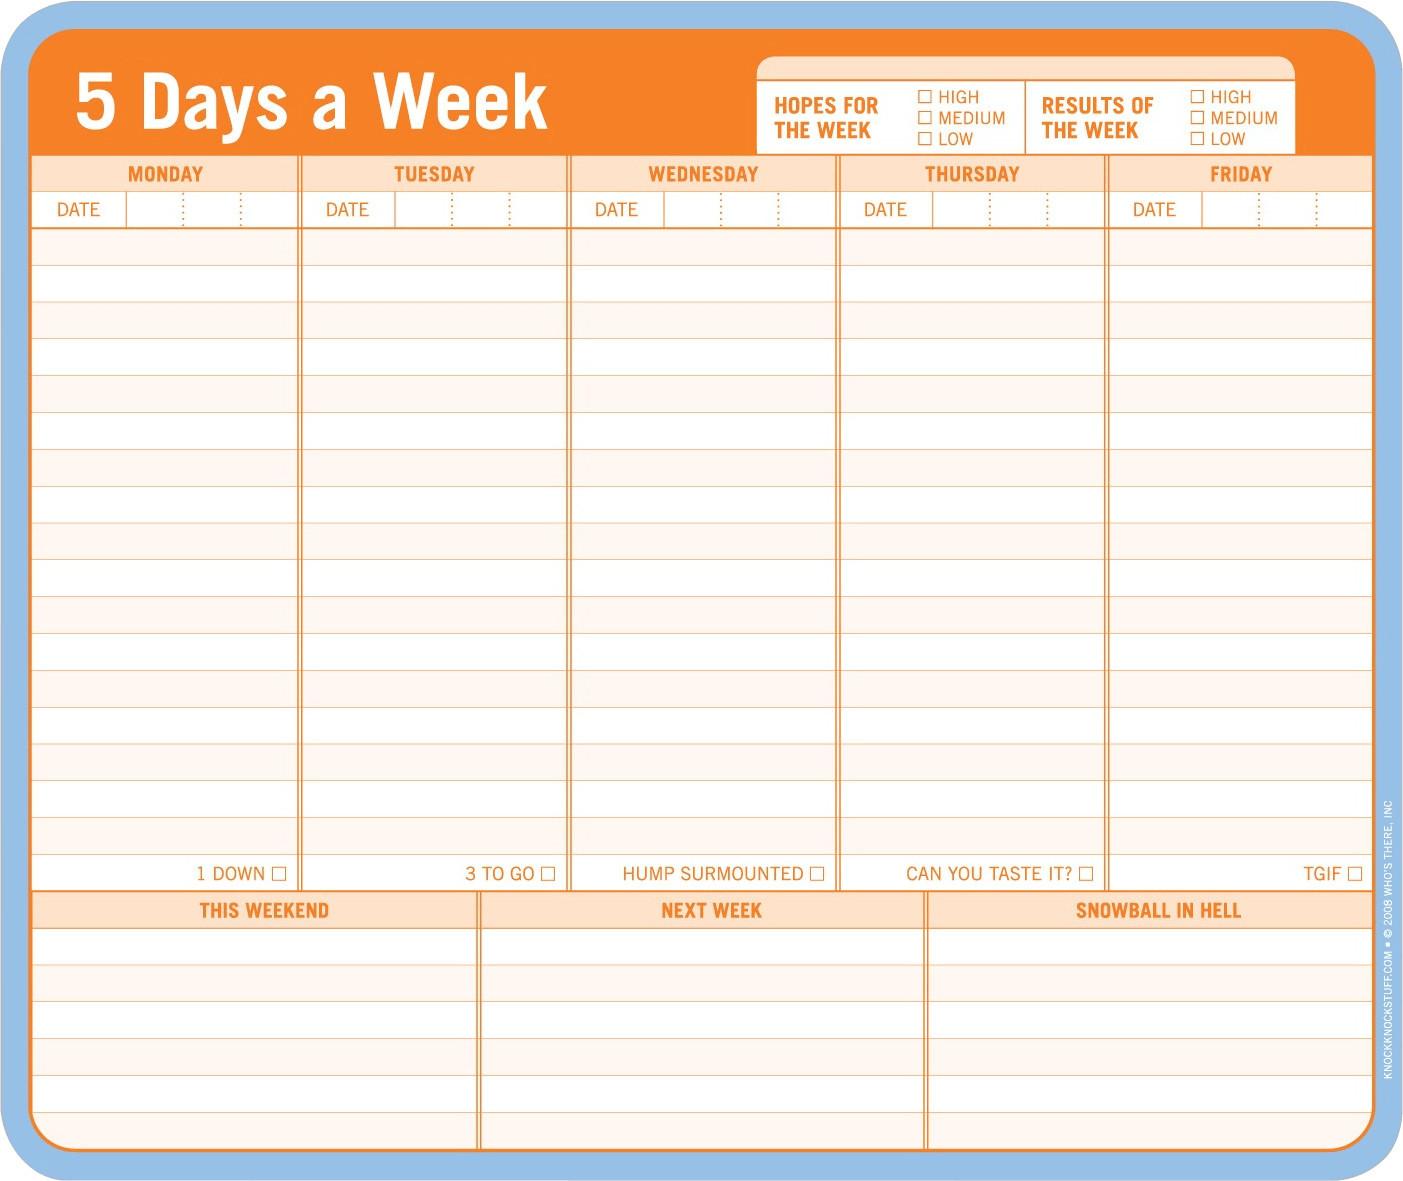 Image of Knock Knock Mousepad - 5 Days a Week